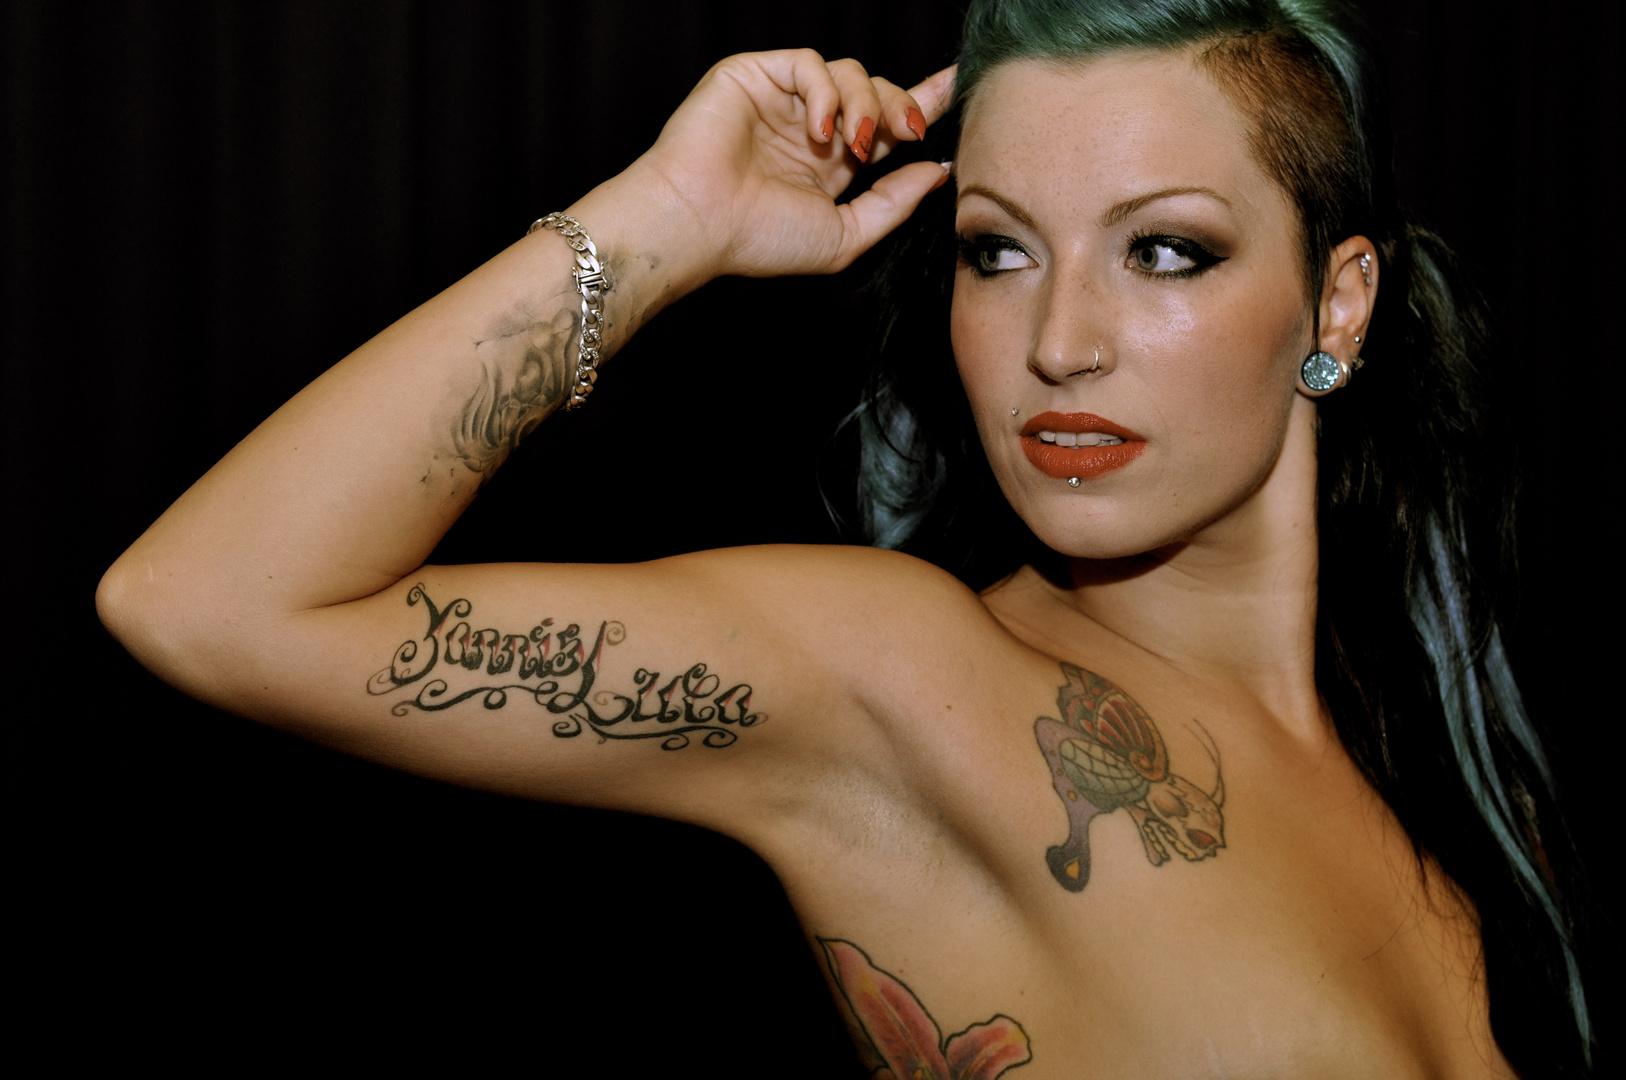 Konfrontation mit Tattoos